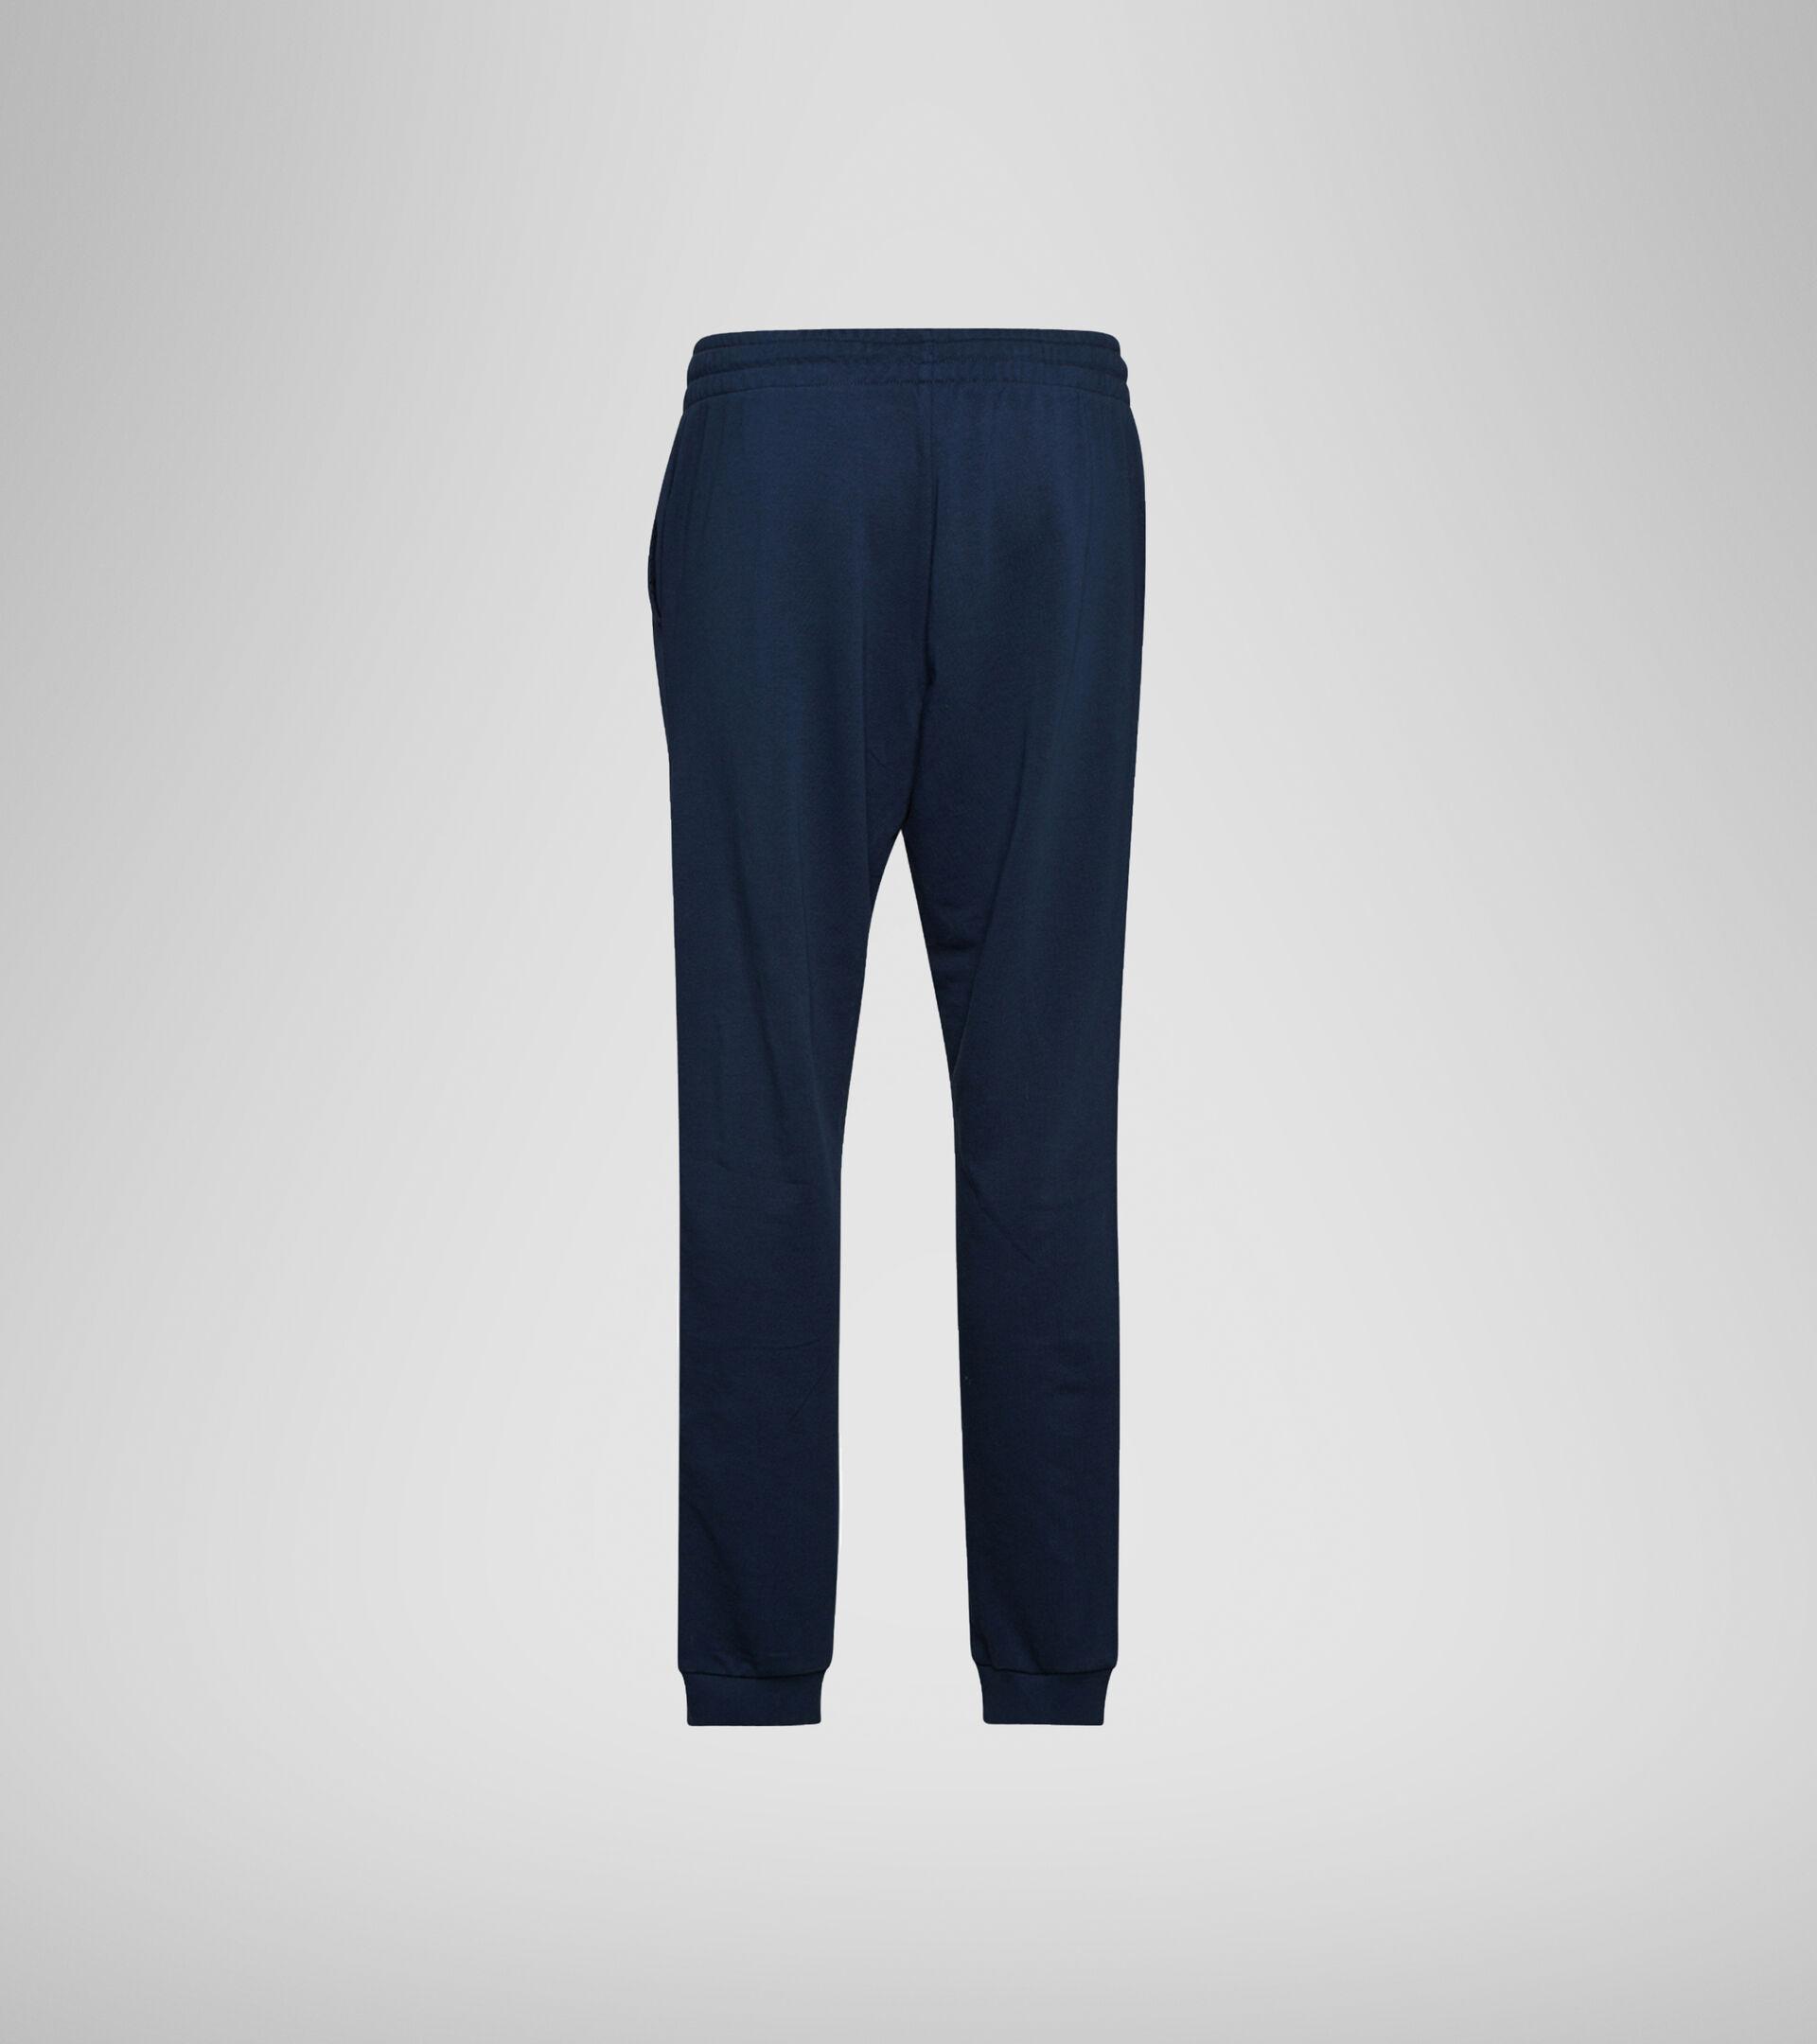 Pantalones deportivos - Hombre PANT CUFF DIADORA CLUB NEGRO IRIS - Diadora